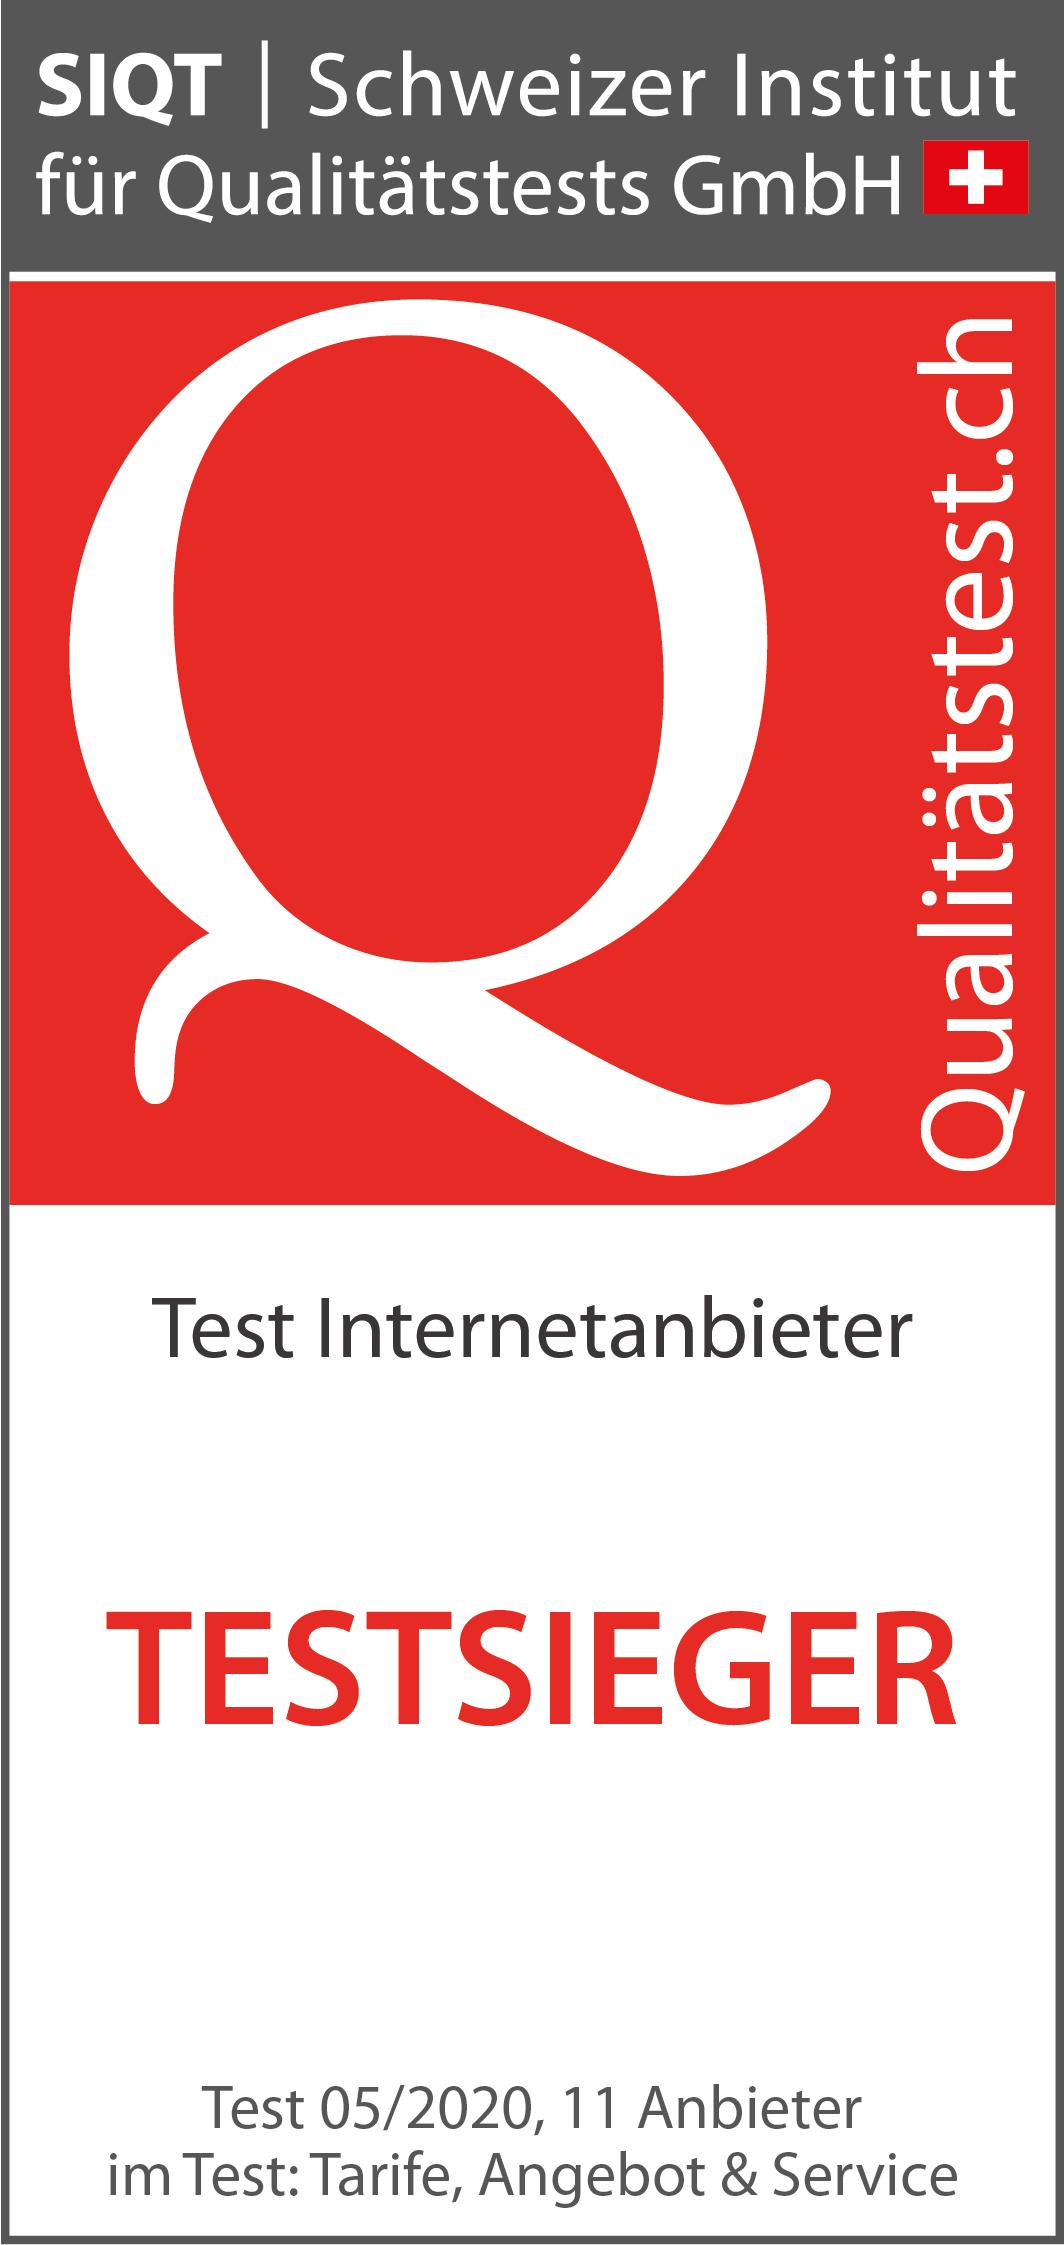 Test Internetanbieter 2020